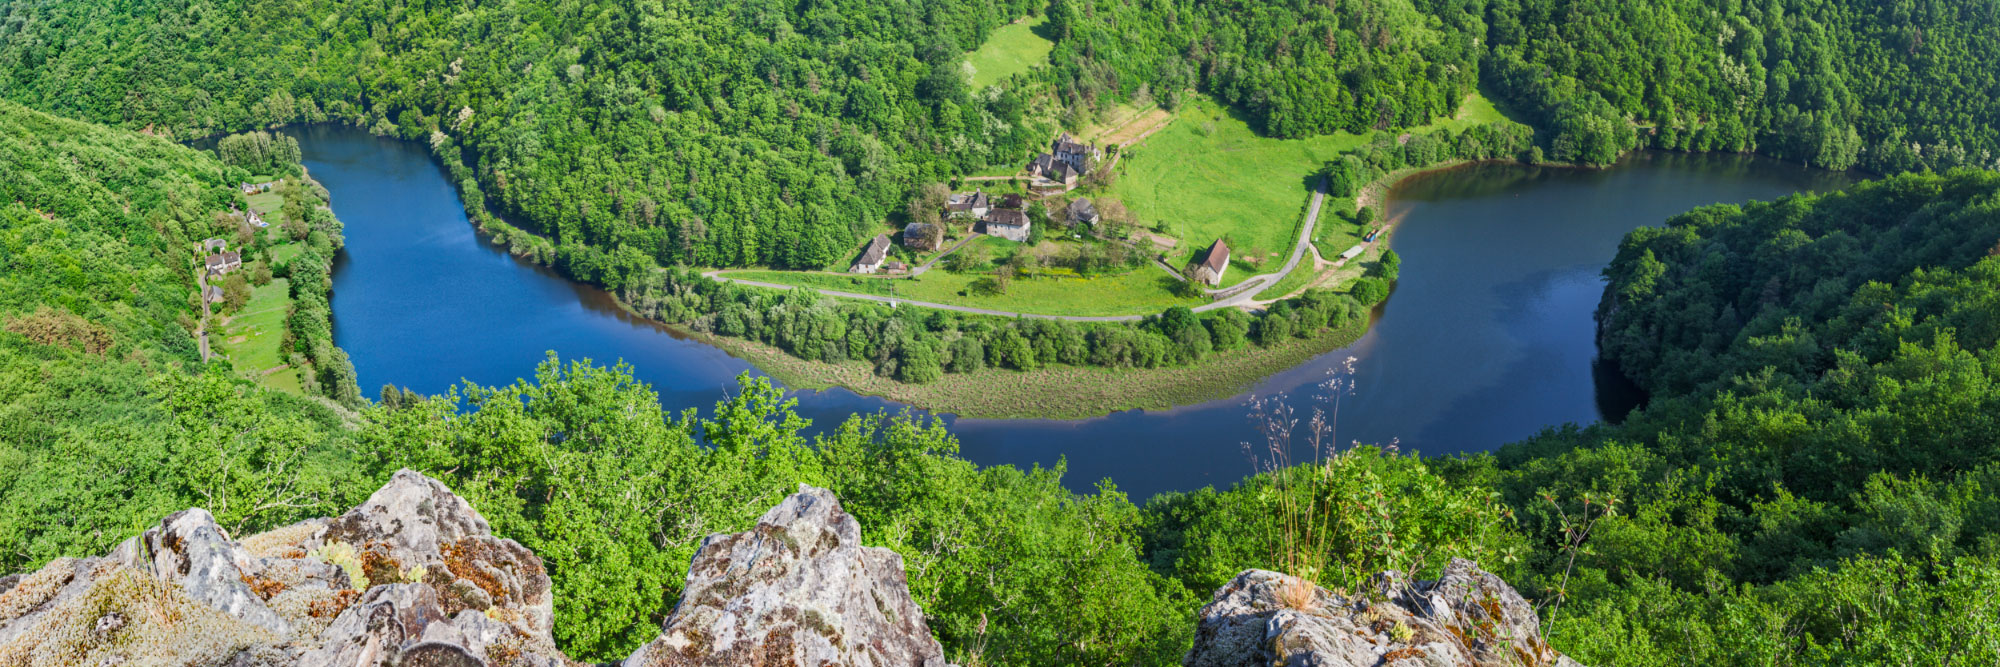 6-14892-france-correze-vallee-de-la-dordogne-roc-castel-panorama-sentucq-h